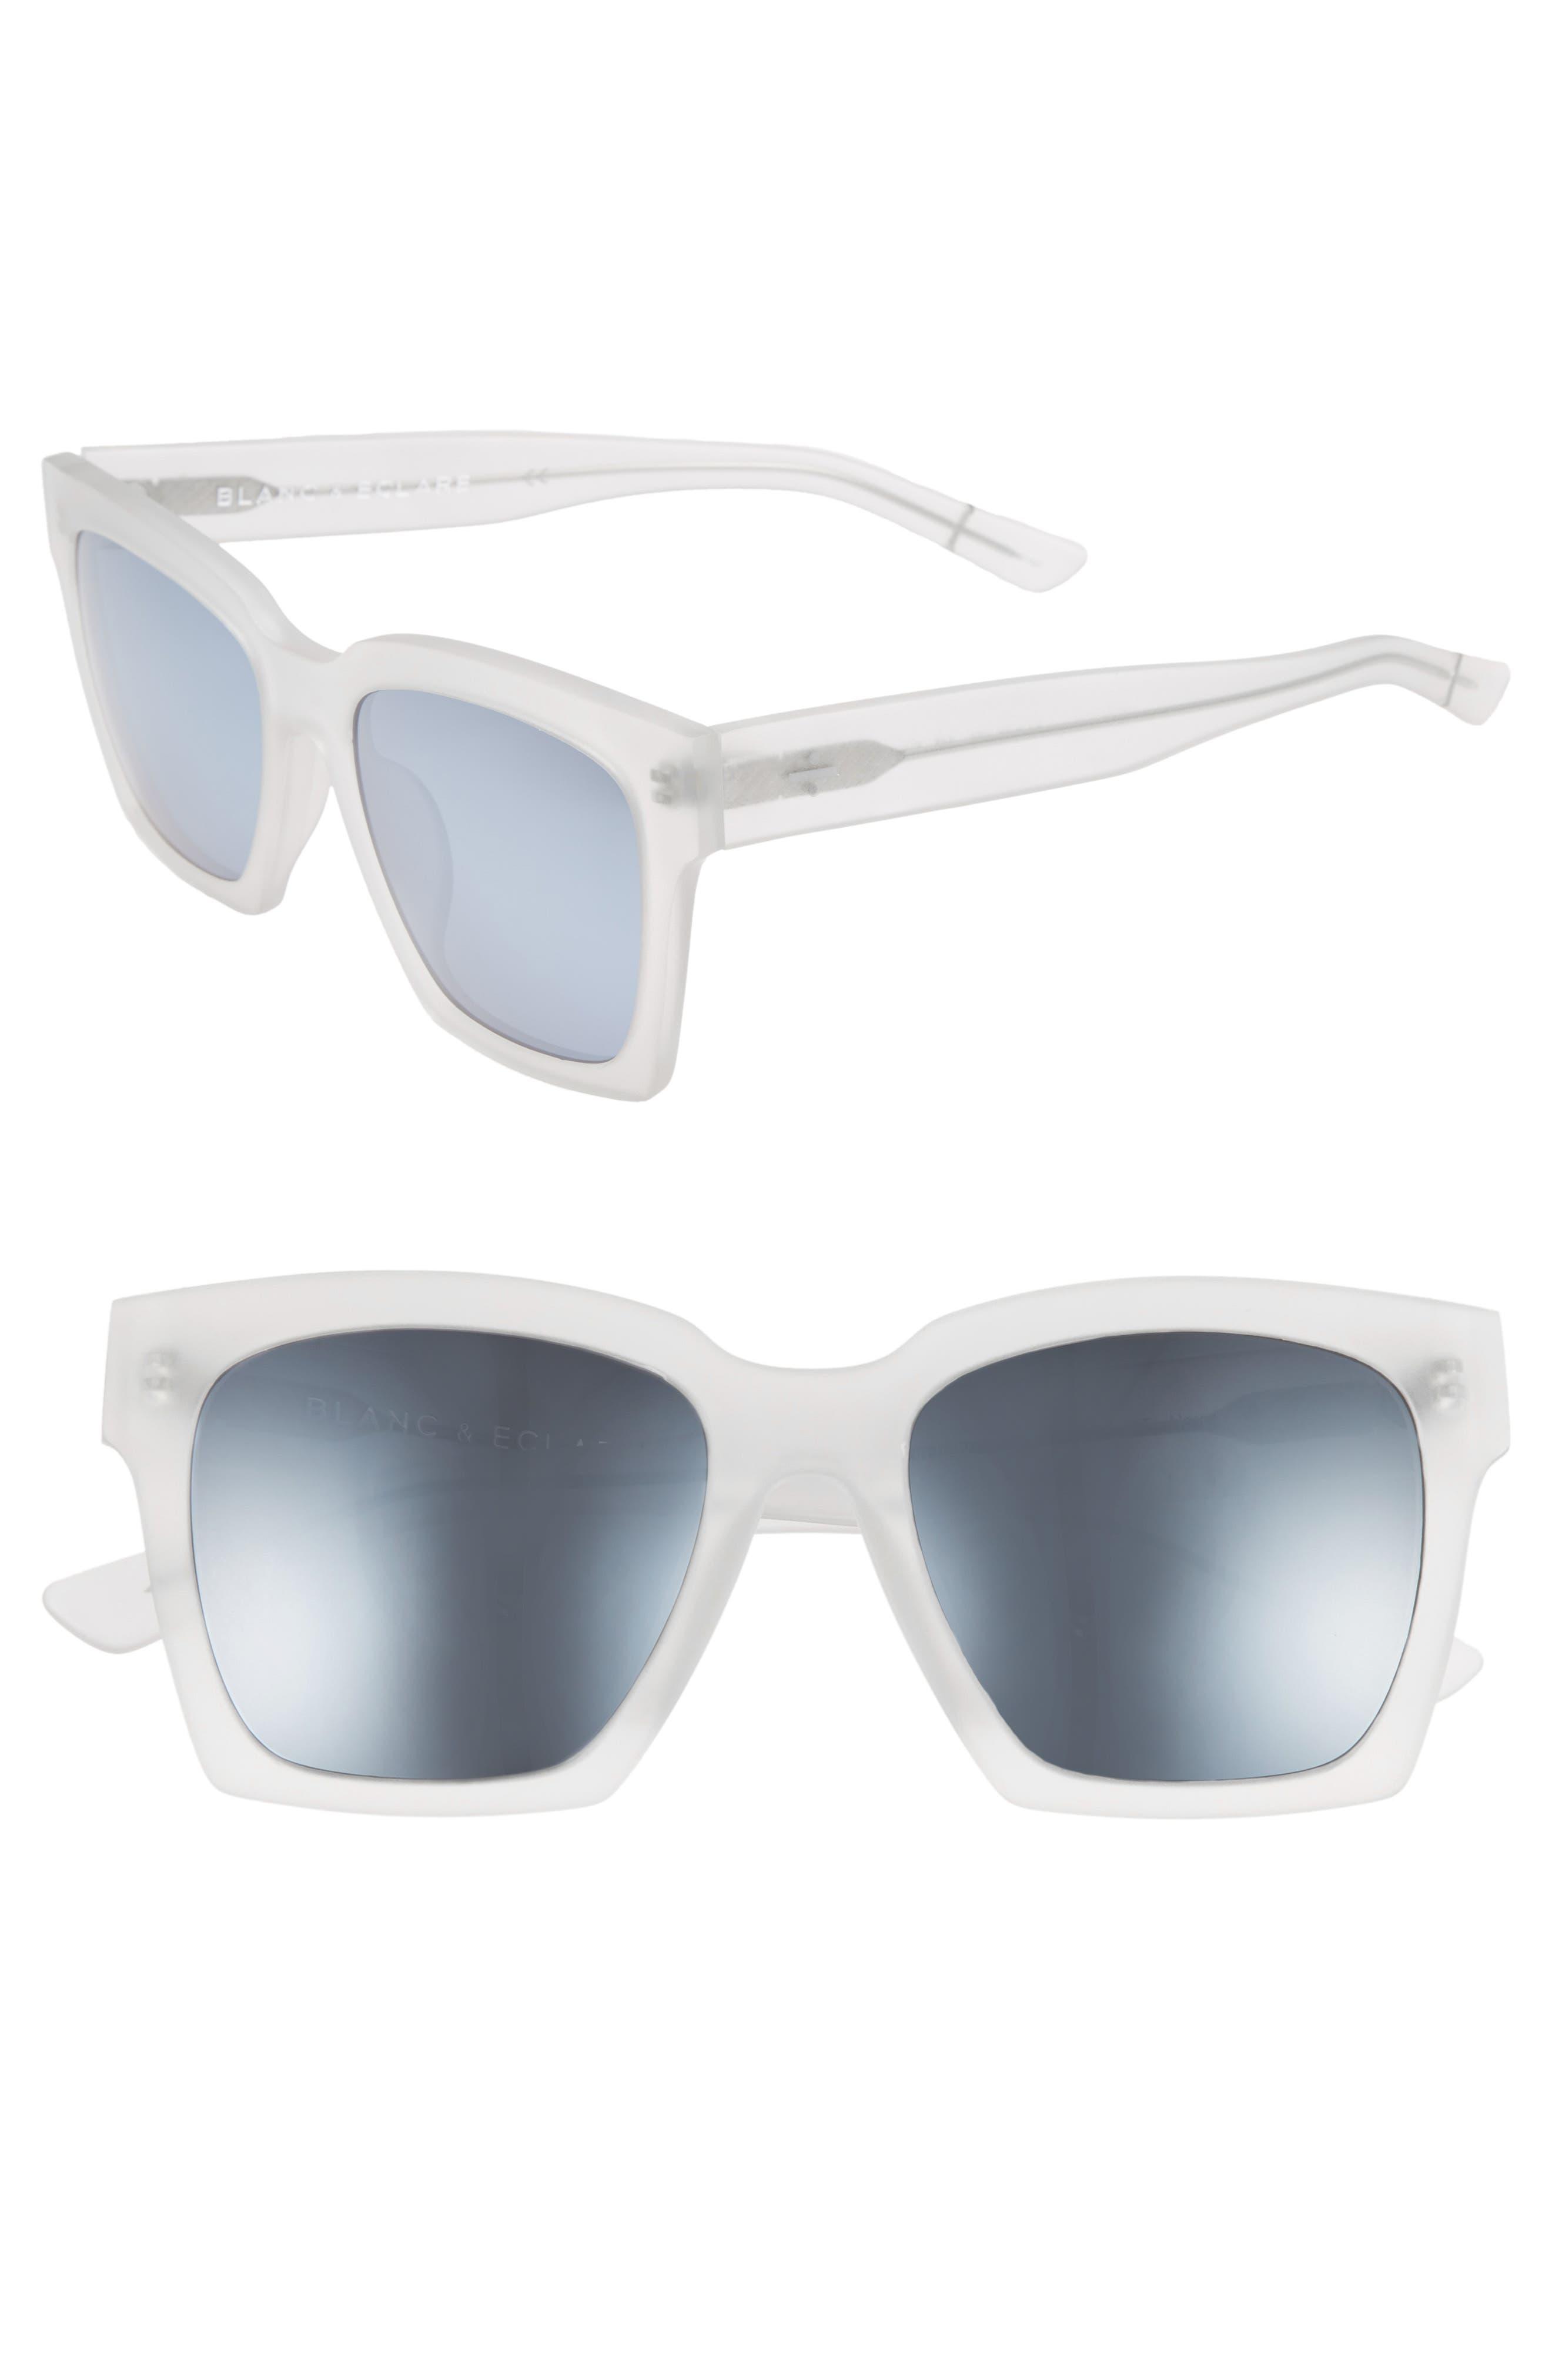 BLANC & ECLARE New York 54mm Polarized Sunglasses